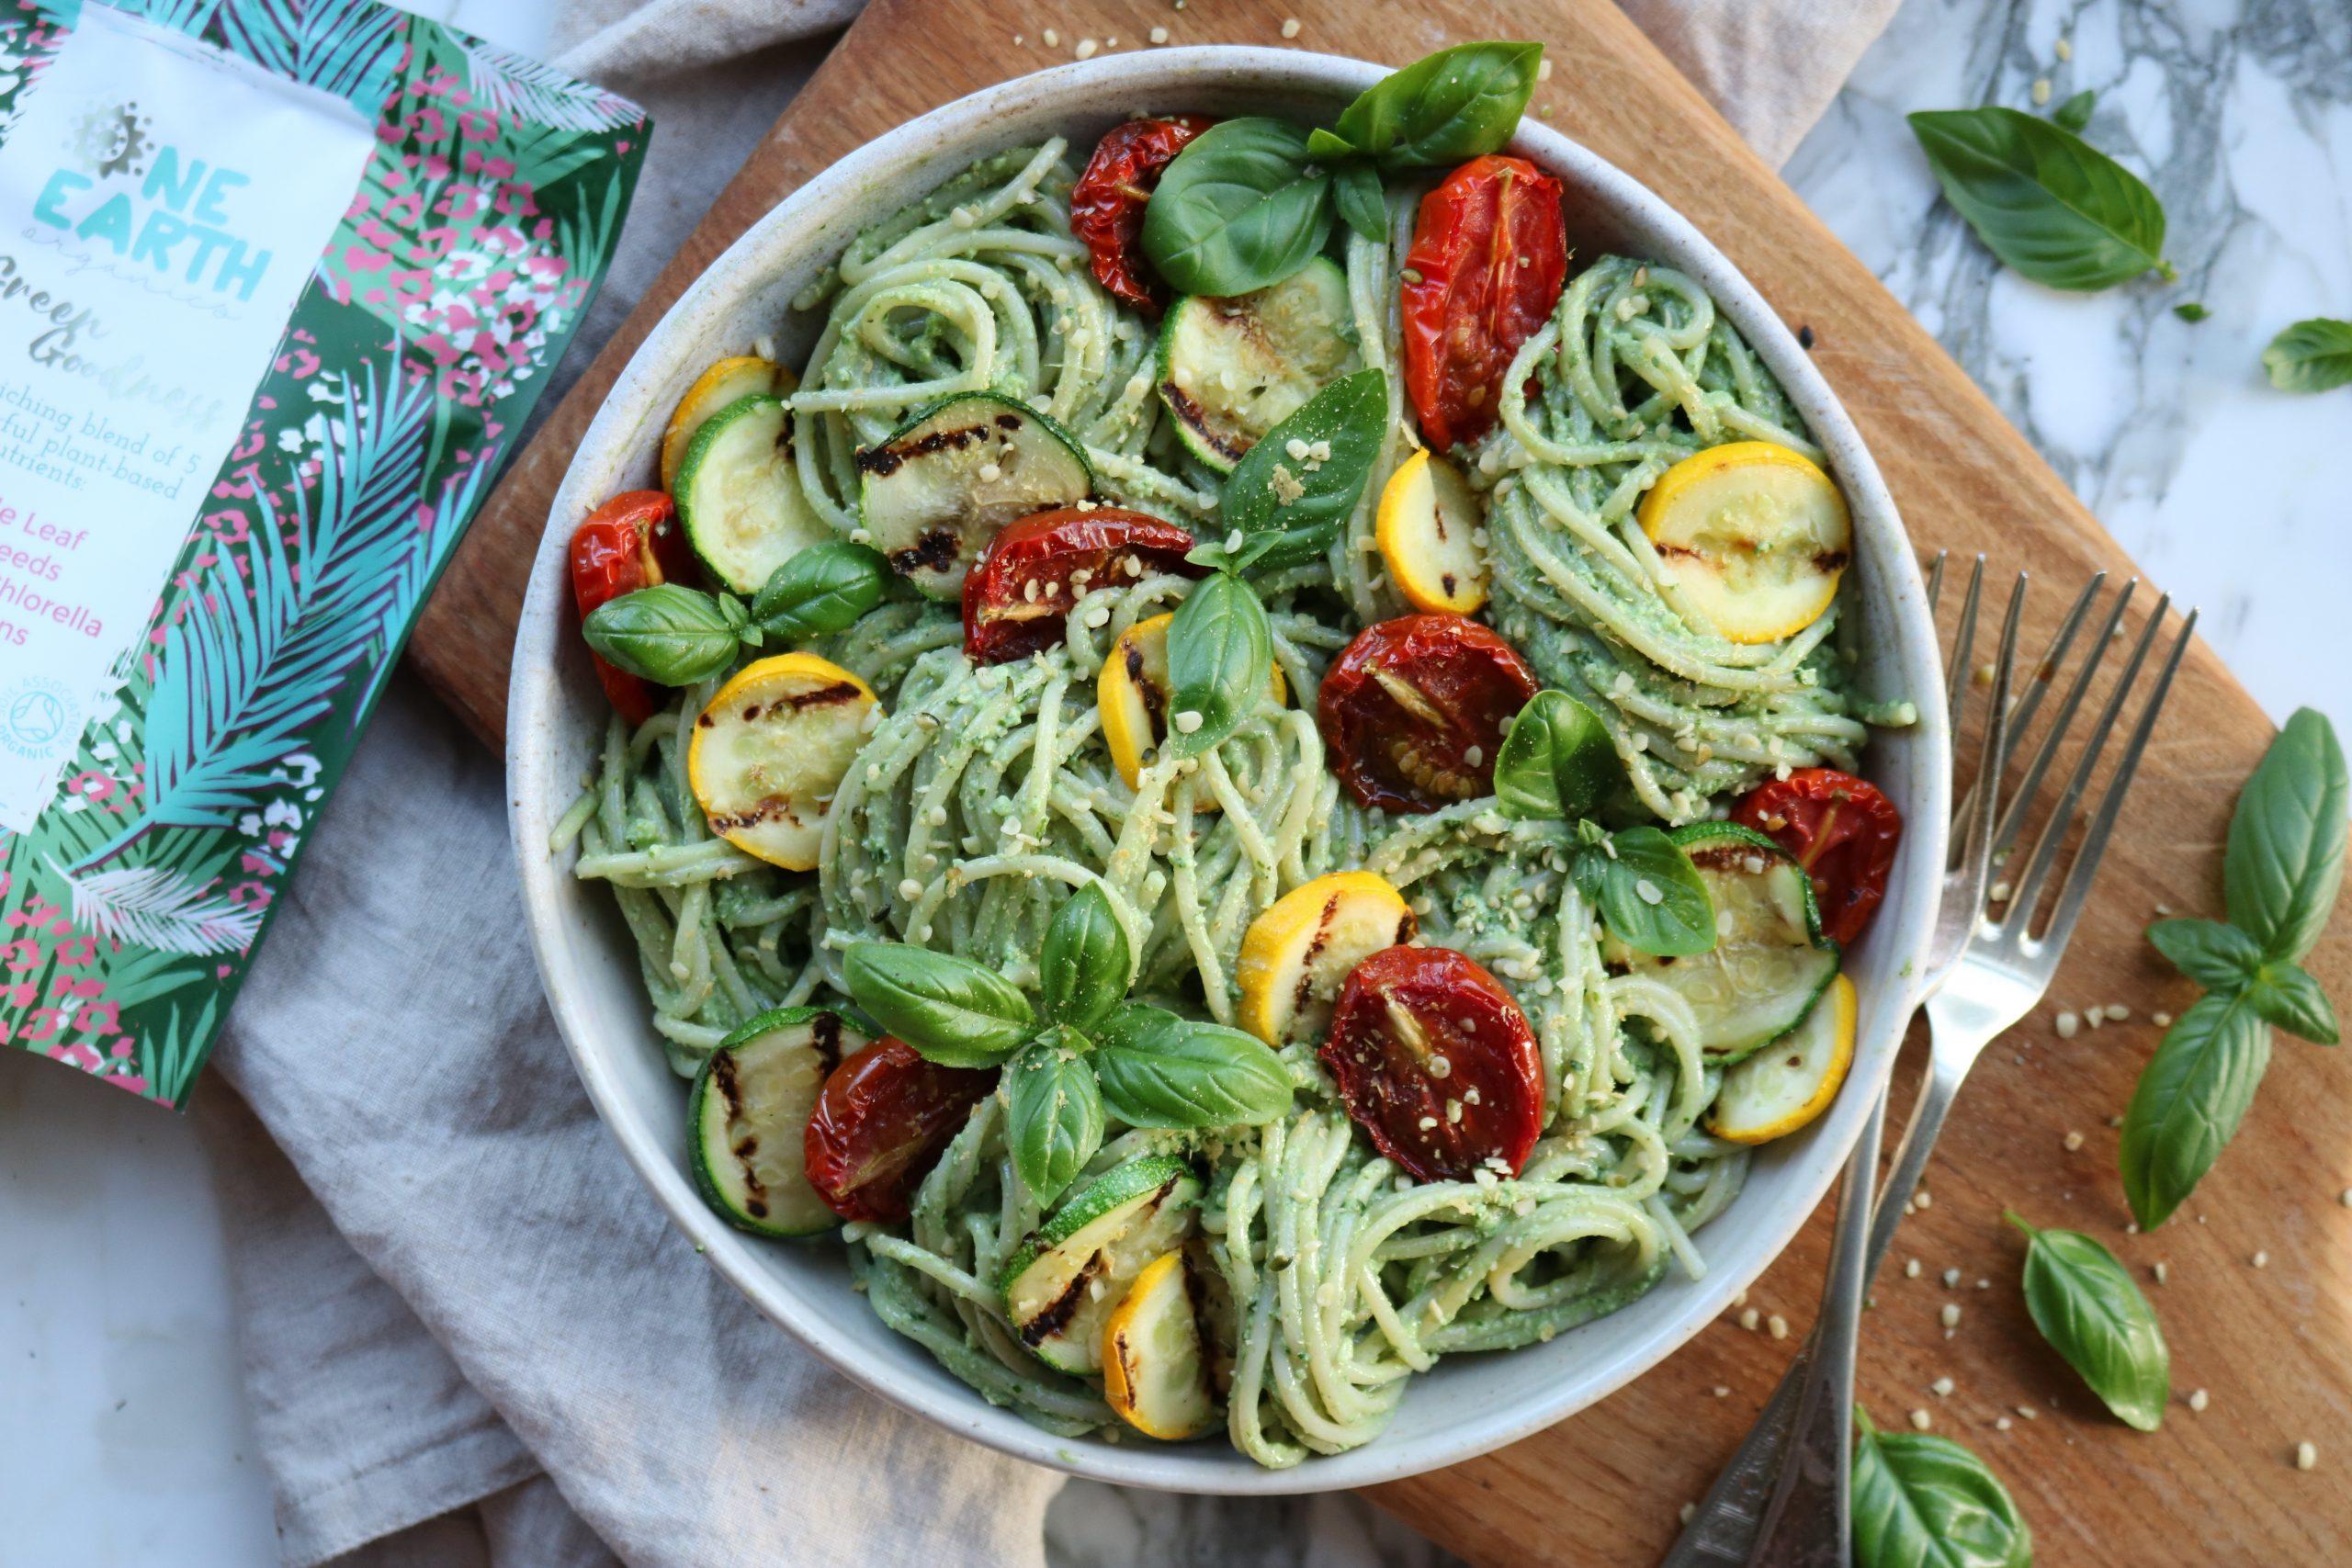 Green Goddess Macadamia Pesto Pasta